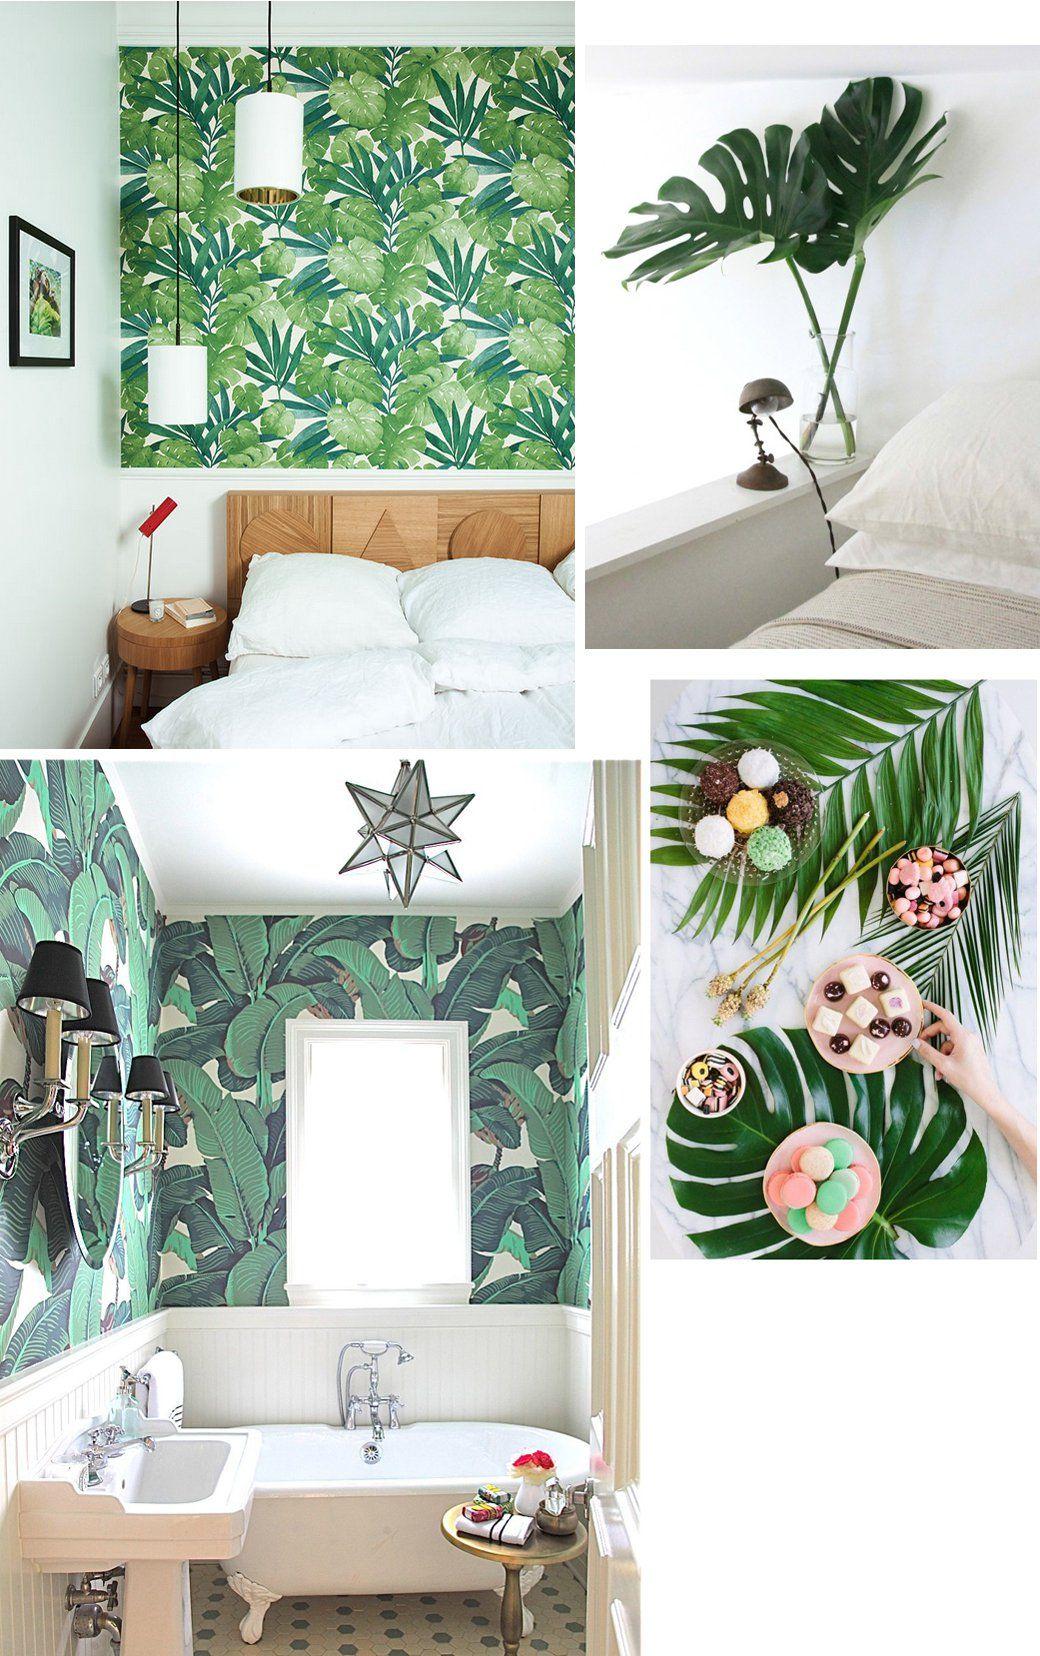 8 Leaves To Love Tropical Leaf Decor Ideas Decor8